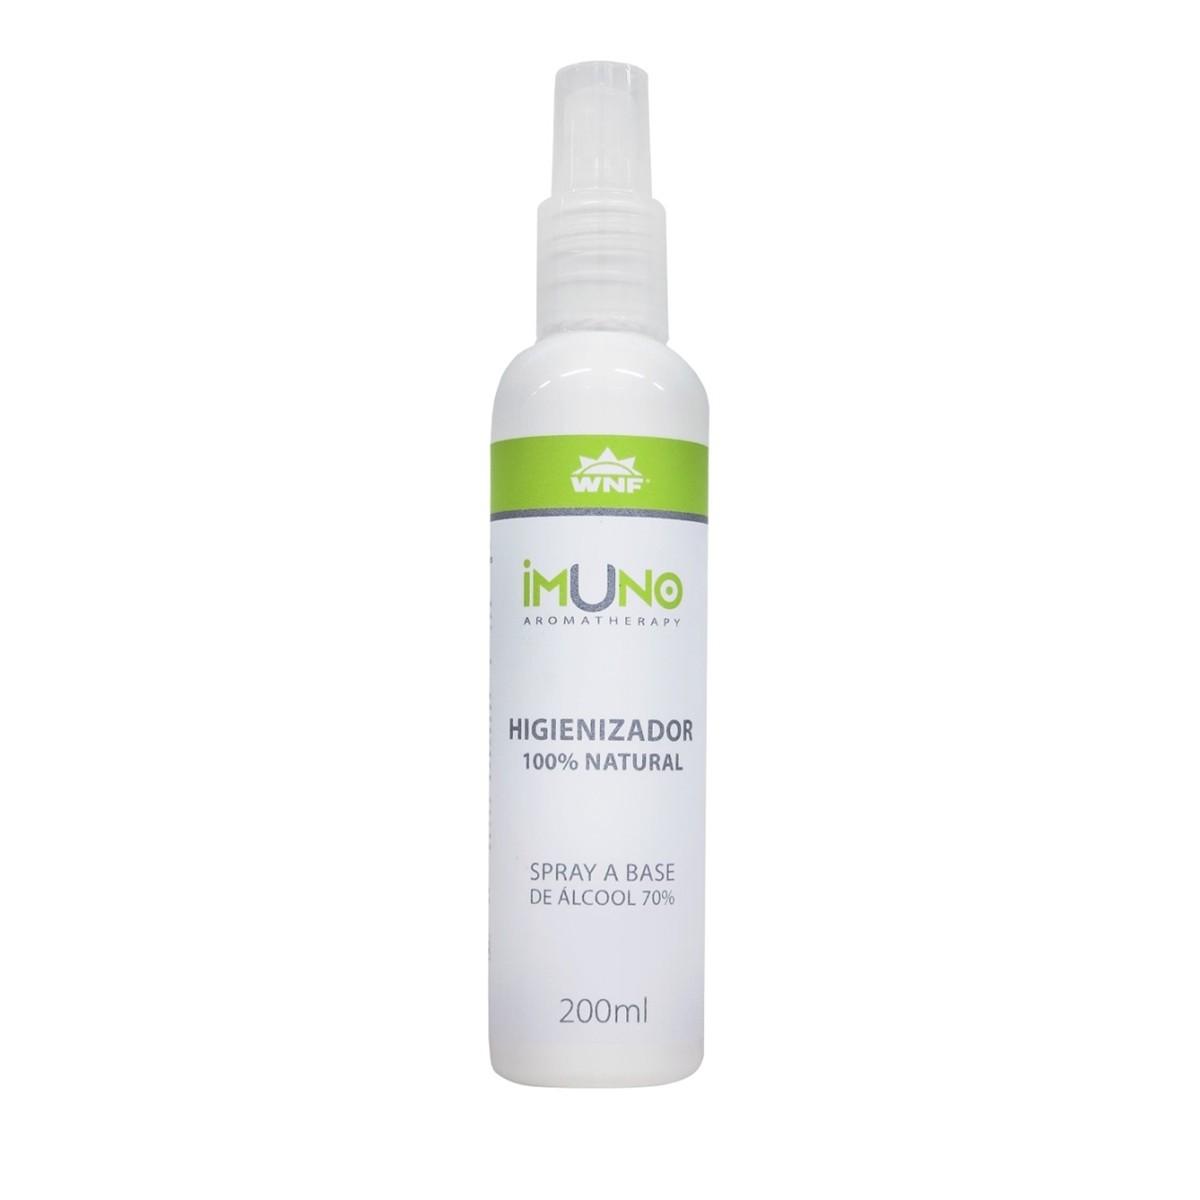 Higienizador Natural e Vegano Imuno WNF 200 ml